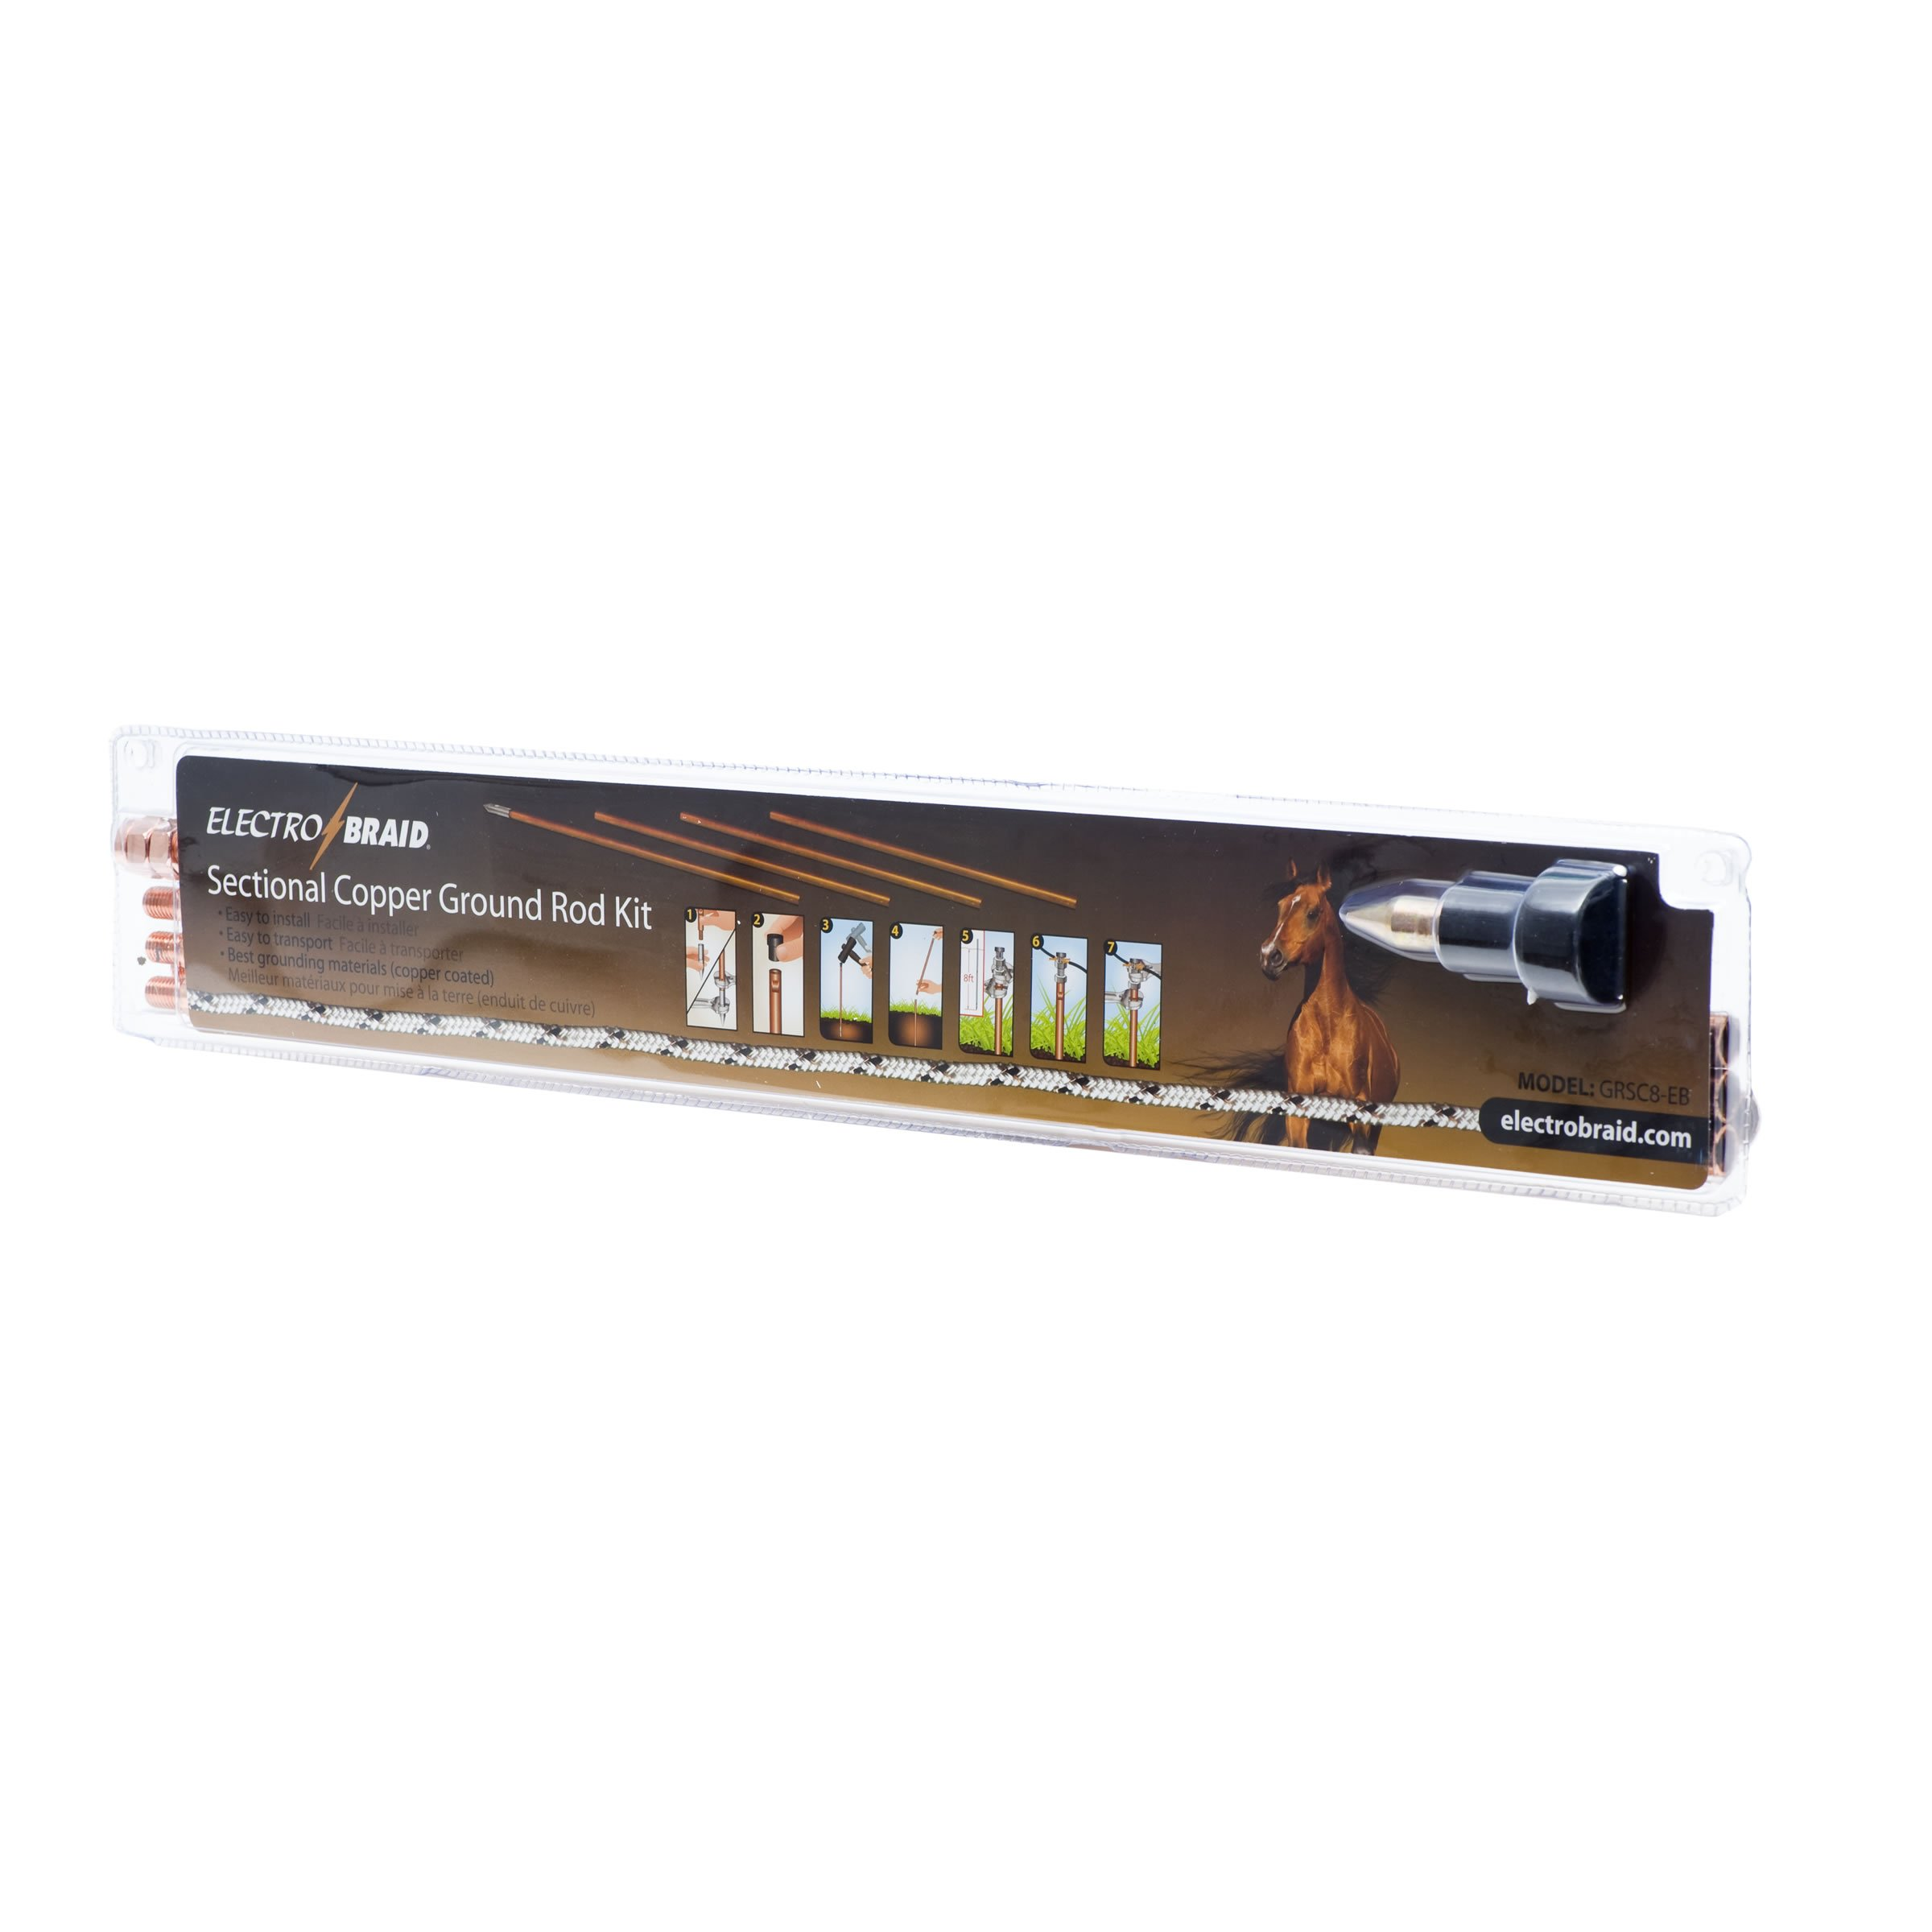 ElectroBraid GRSC8-EB Copper Sectional Ground Rod Kit